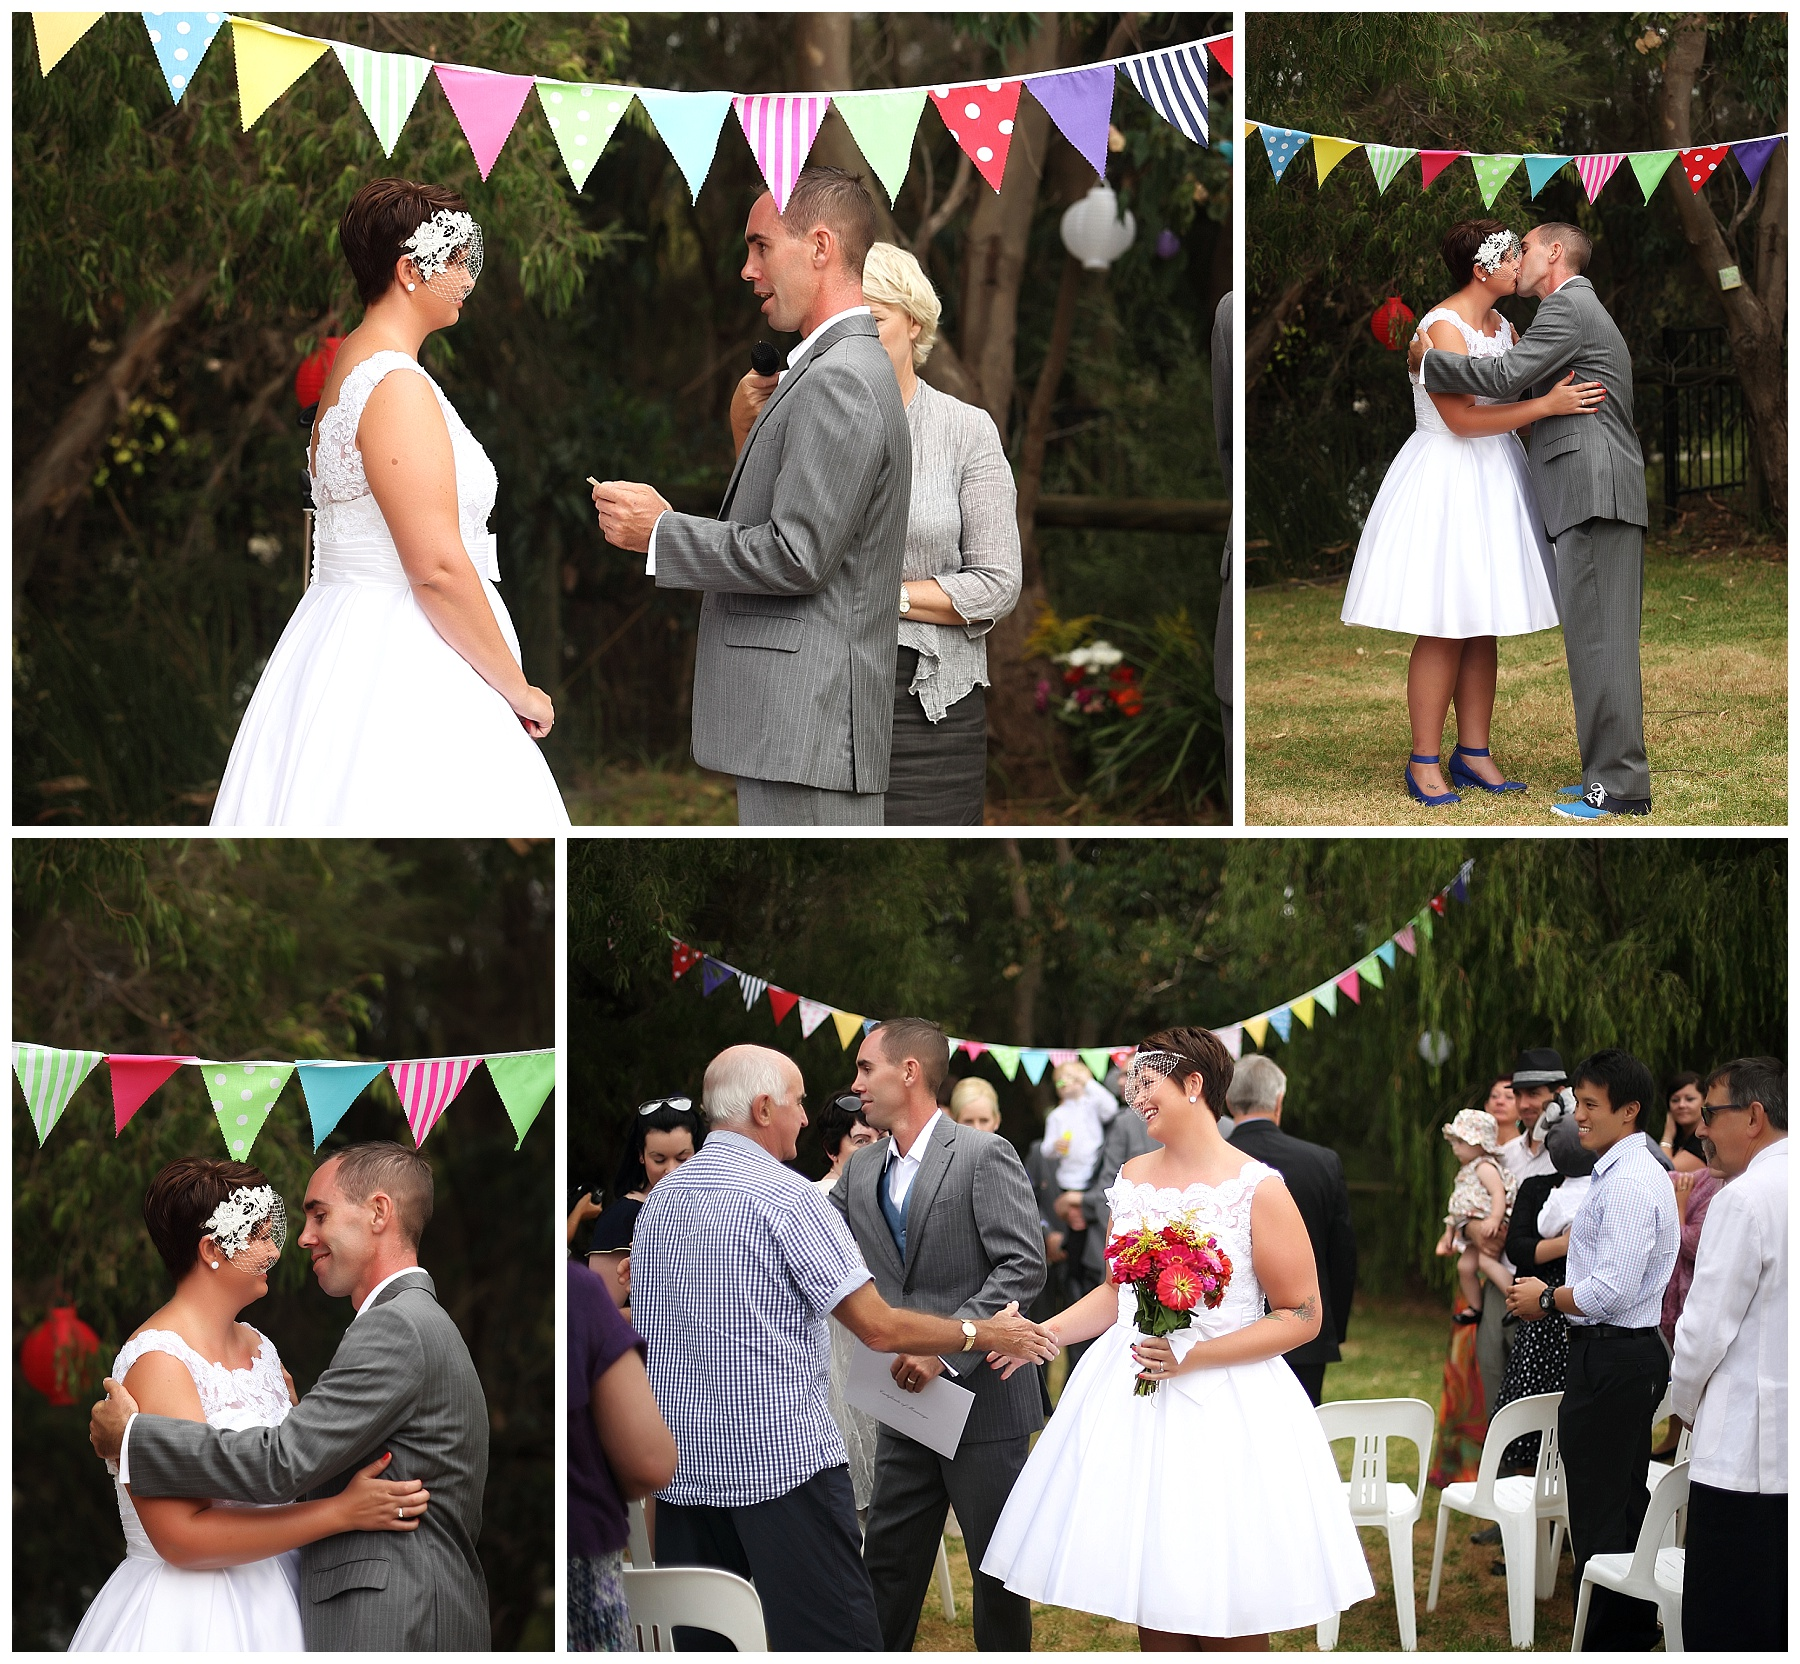 Wedding Photographer Busselton